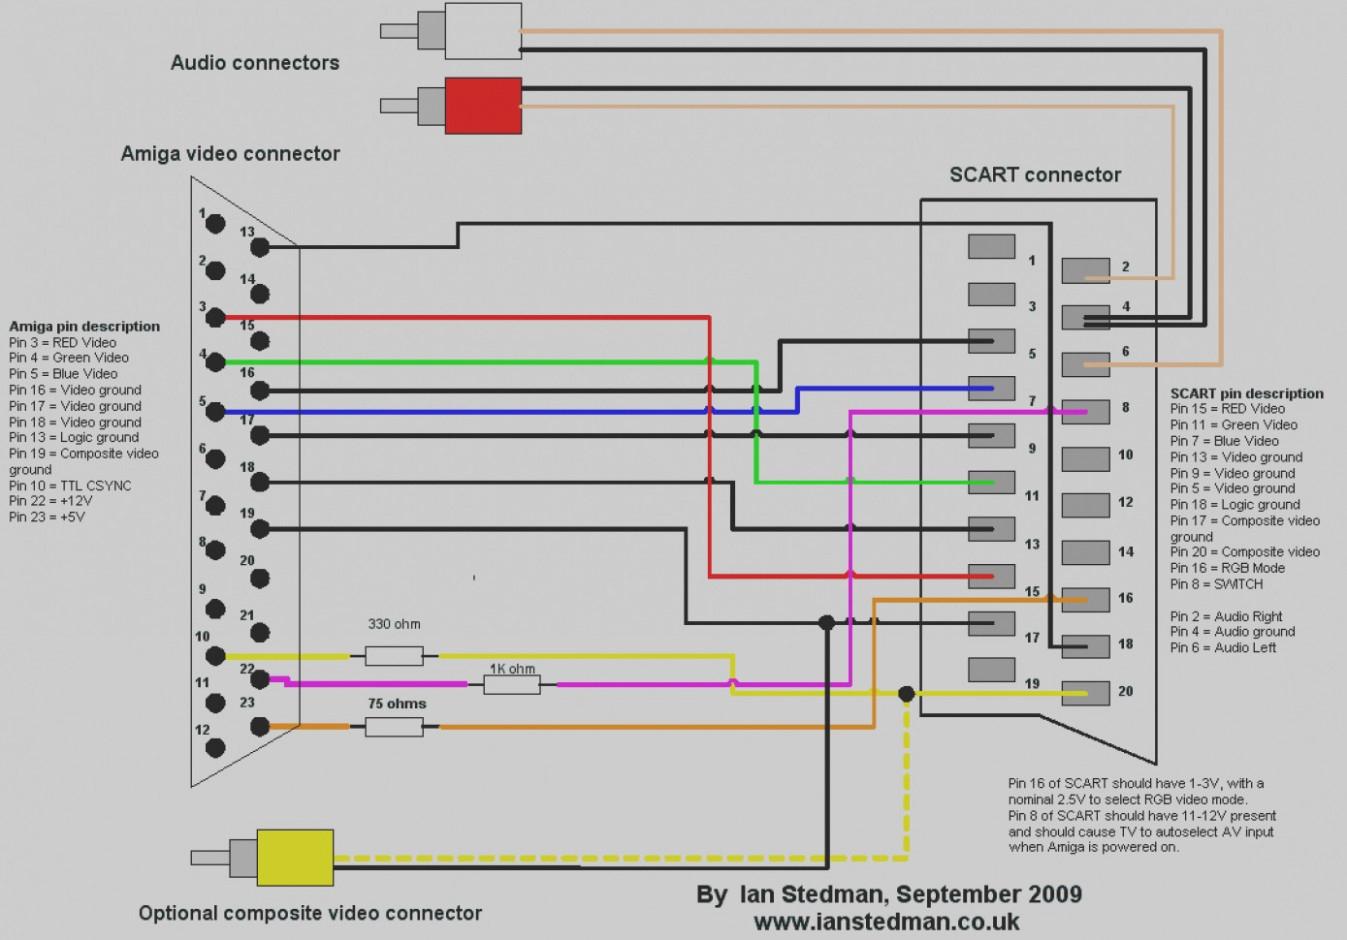 Hdmi To Rca Wiring Diagram | Wiring Diagram - Hdmi To Rca Cable Wiring Diagram